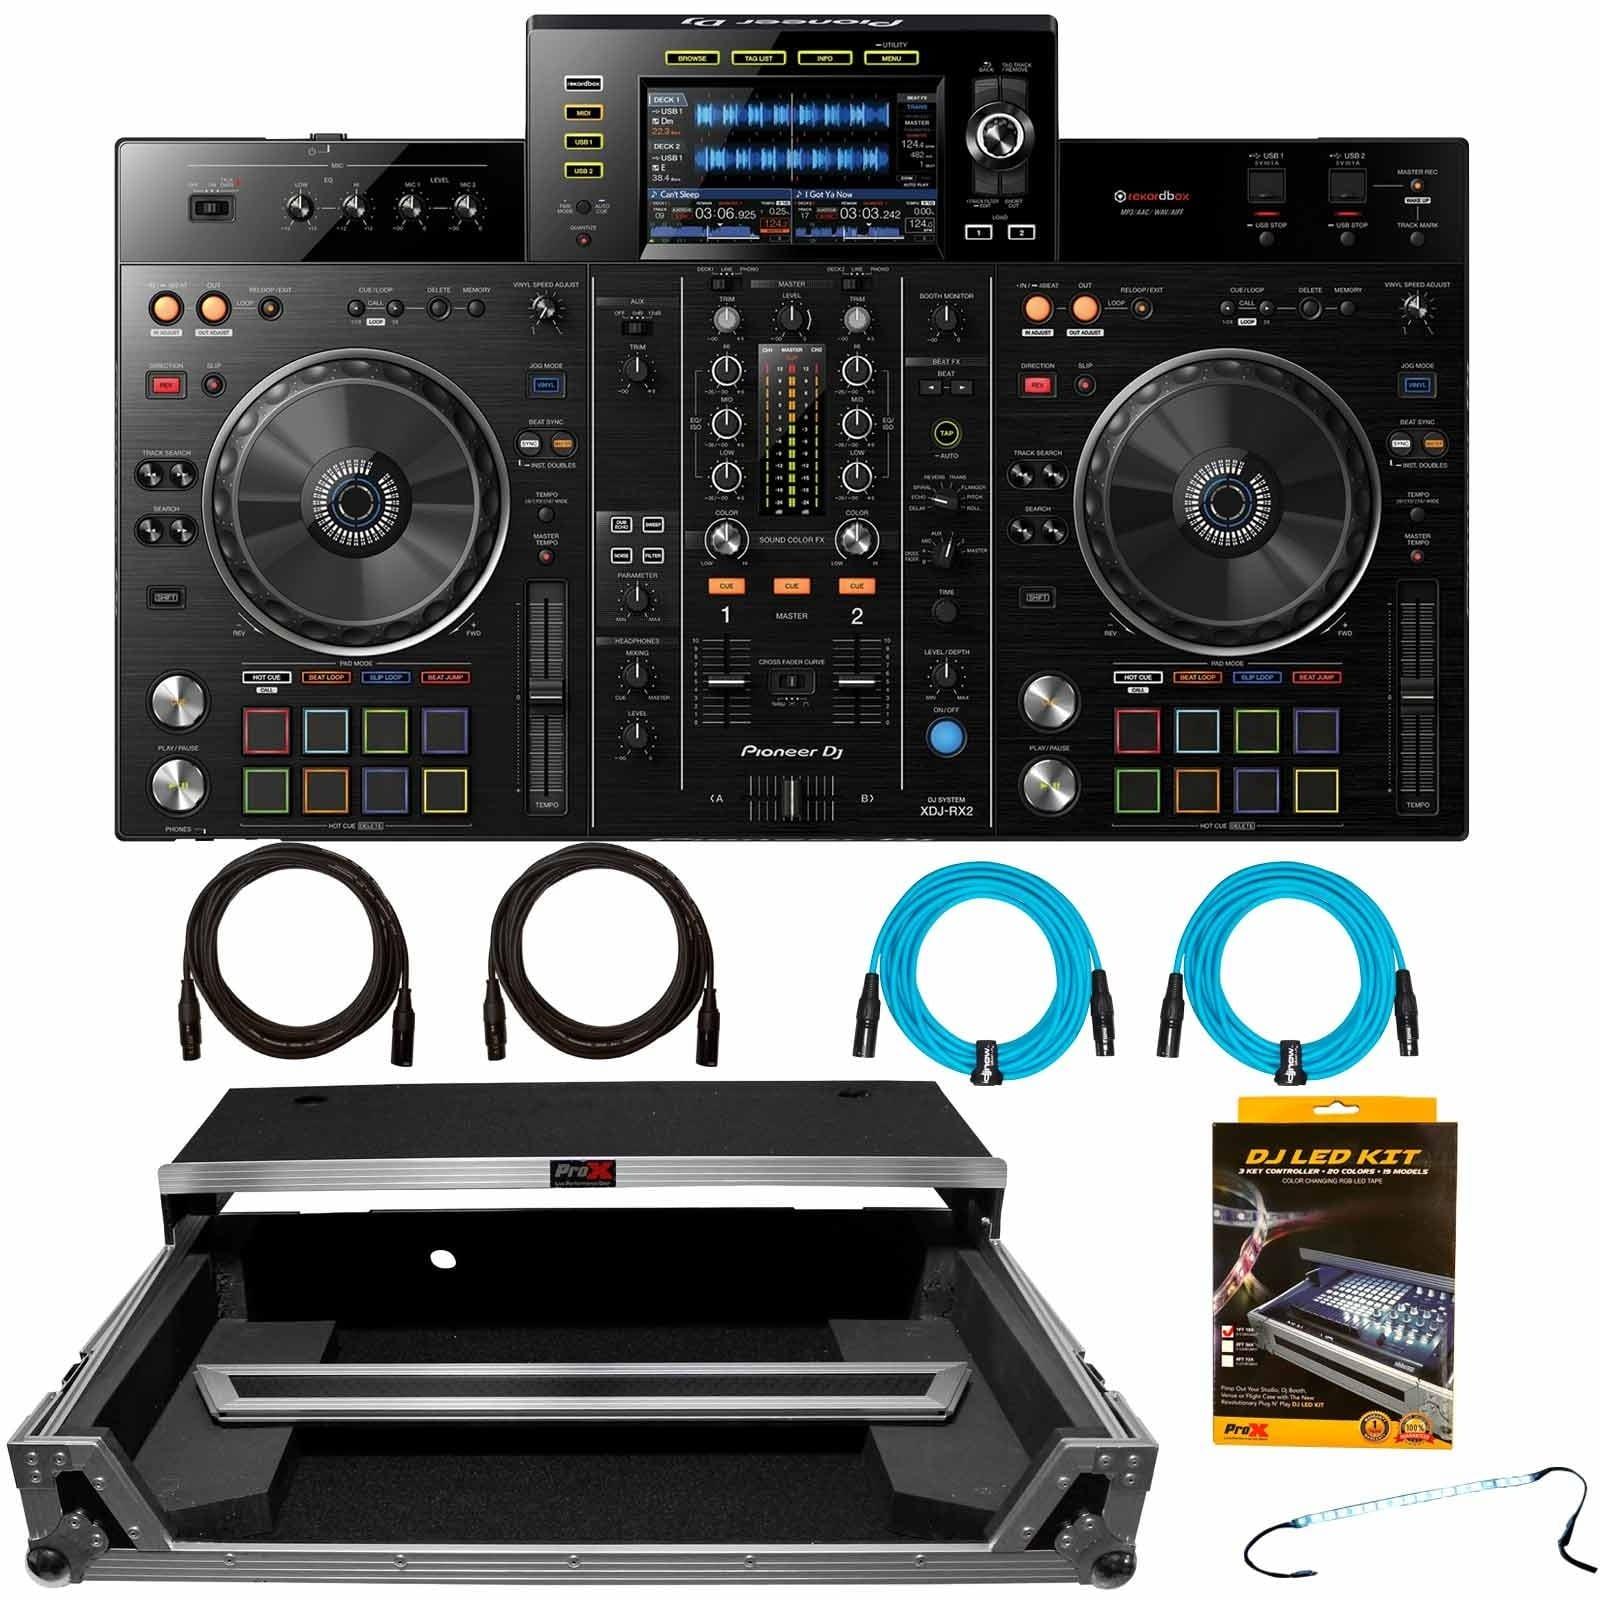 pioneer-dj-xdj-rx2-2-channel-professional-rekordbox-dj-system-with-chrome-silver-flight-case-package-e41.jpg